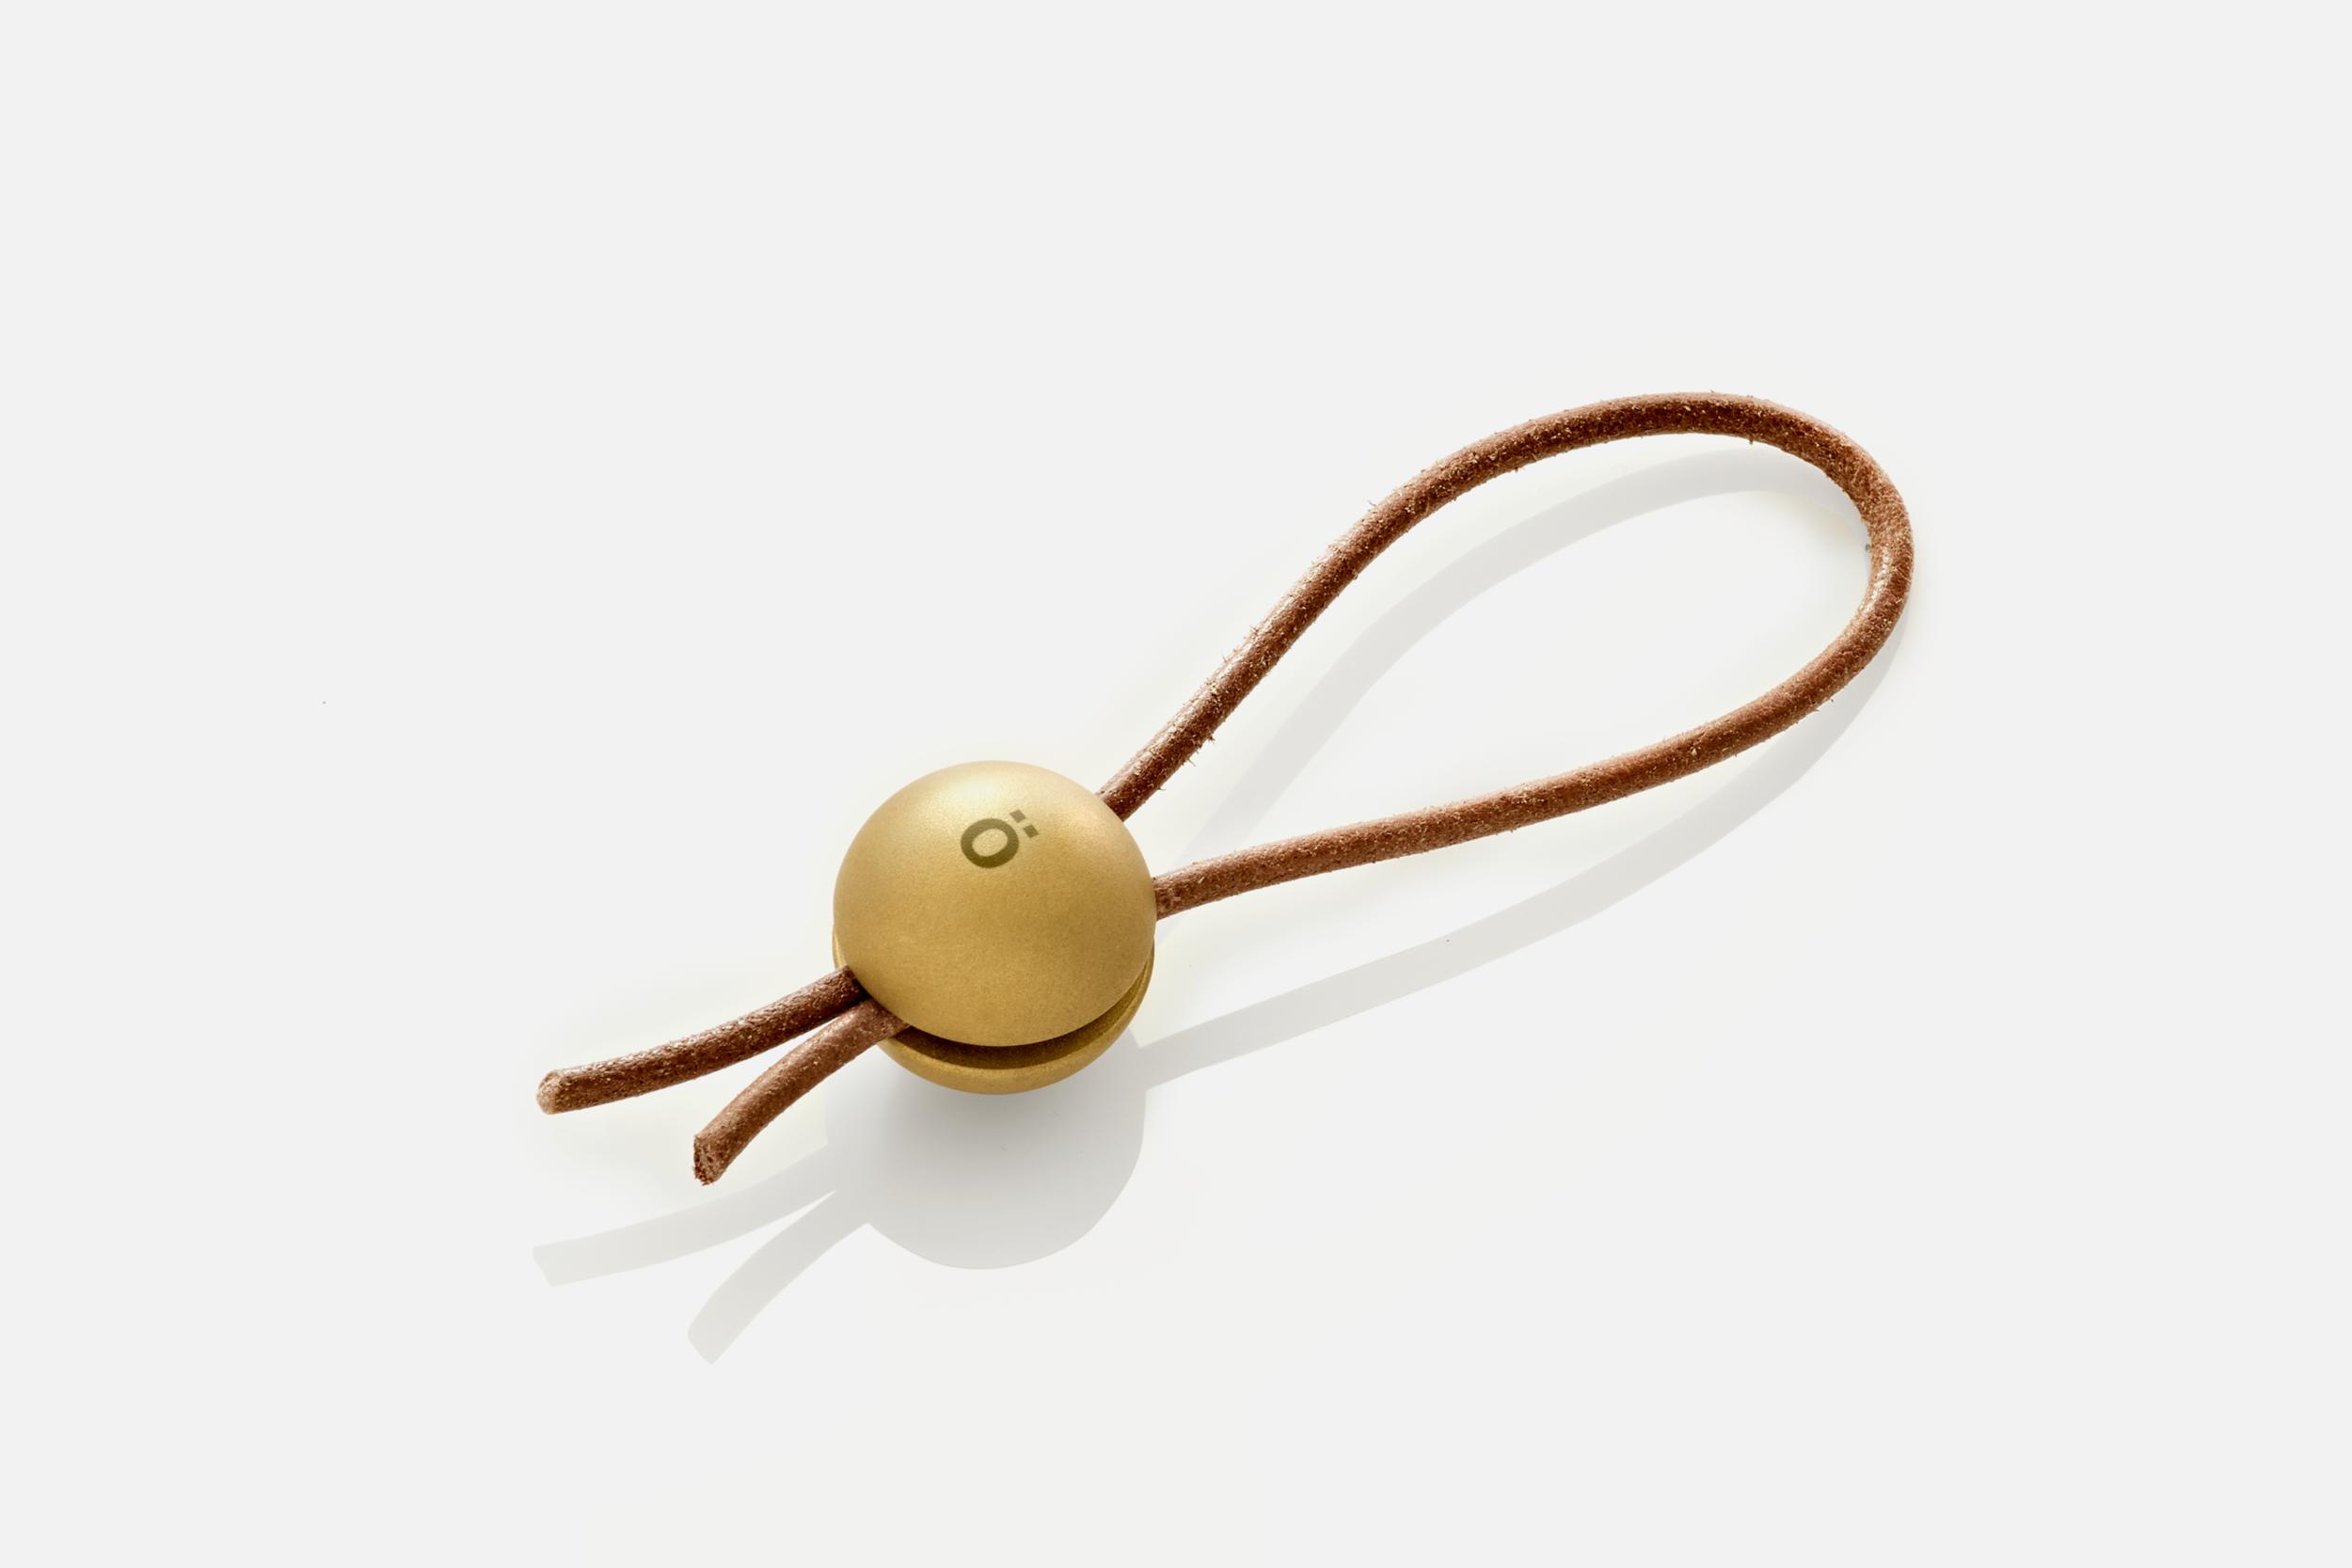 Nördic nøglering - 1 stk, 28 mmRustfrit stål, mat, naturligDesign by H O W, Magnus JørgensenArt. no.: 90513